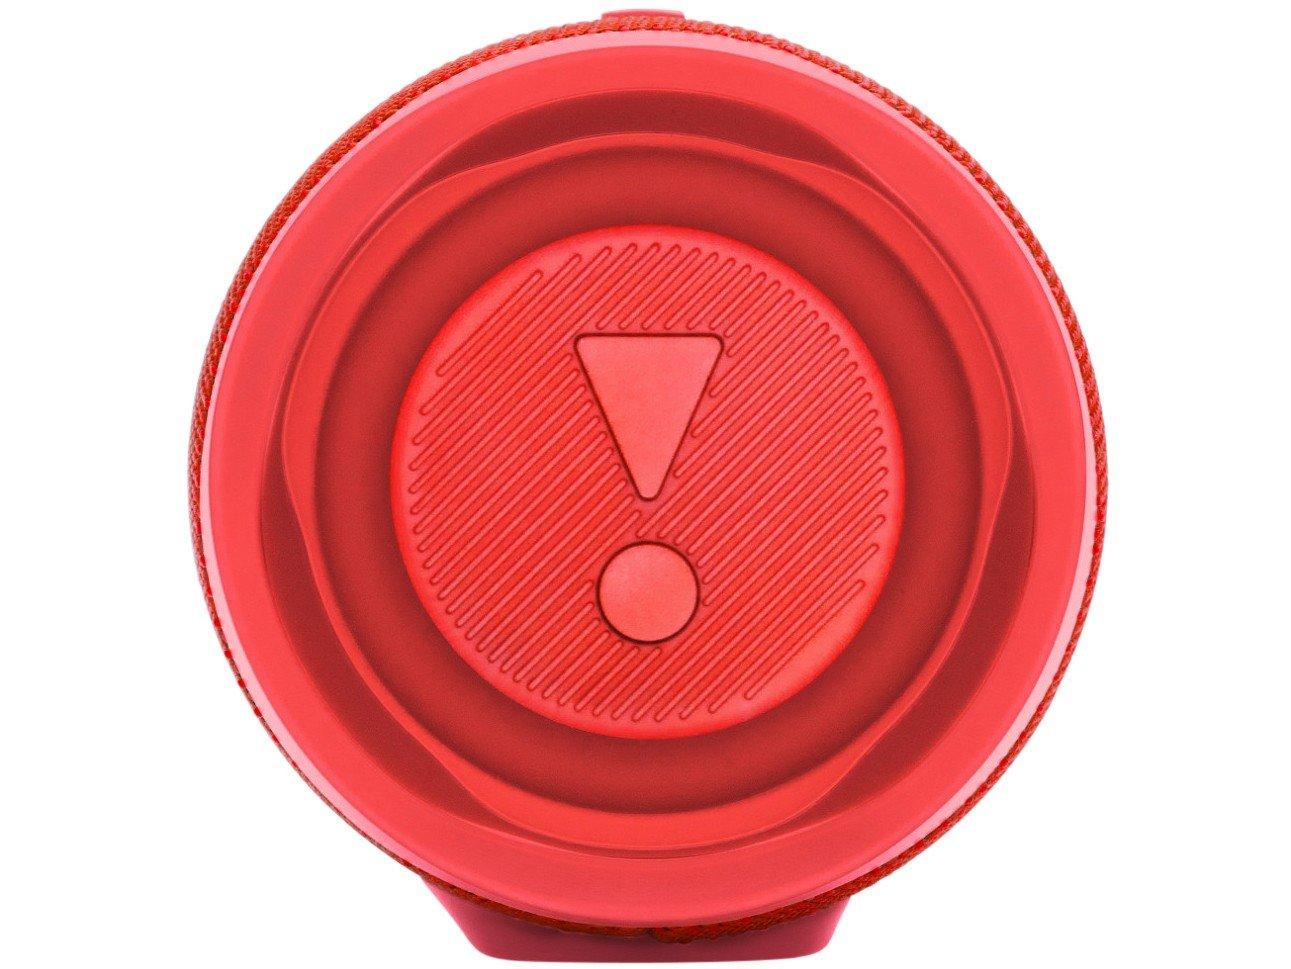 Caixa de Som Bluetooth JBL Charge 4 - à Prova de Água Portátil 30W com Microfone USB - Bivolt - 16